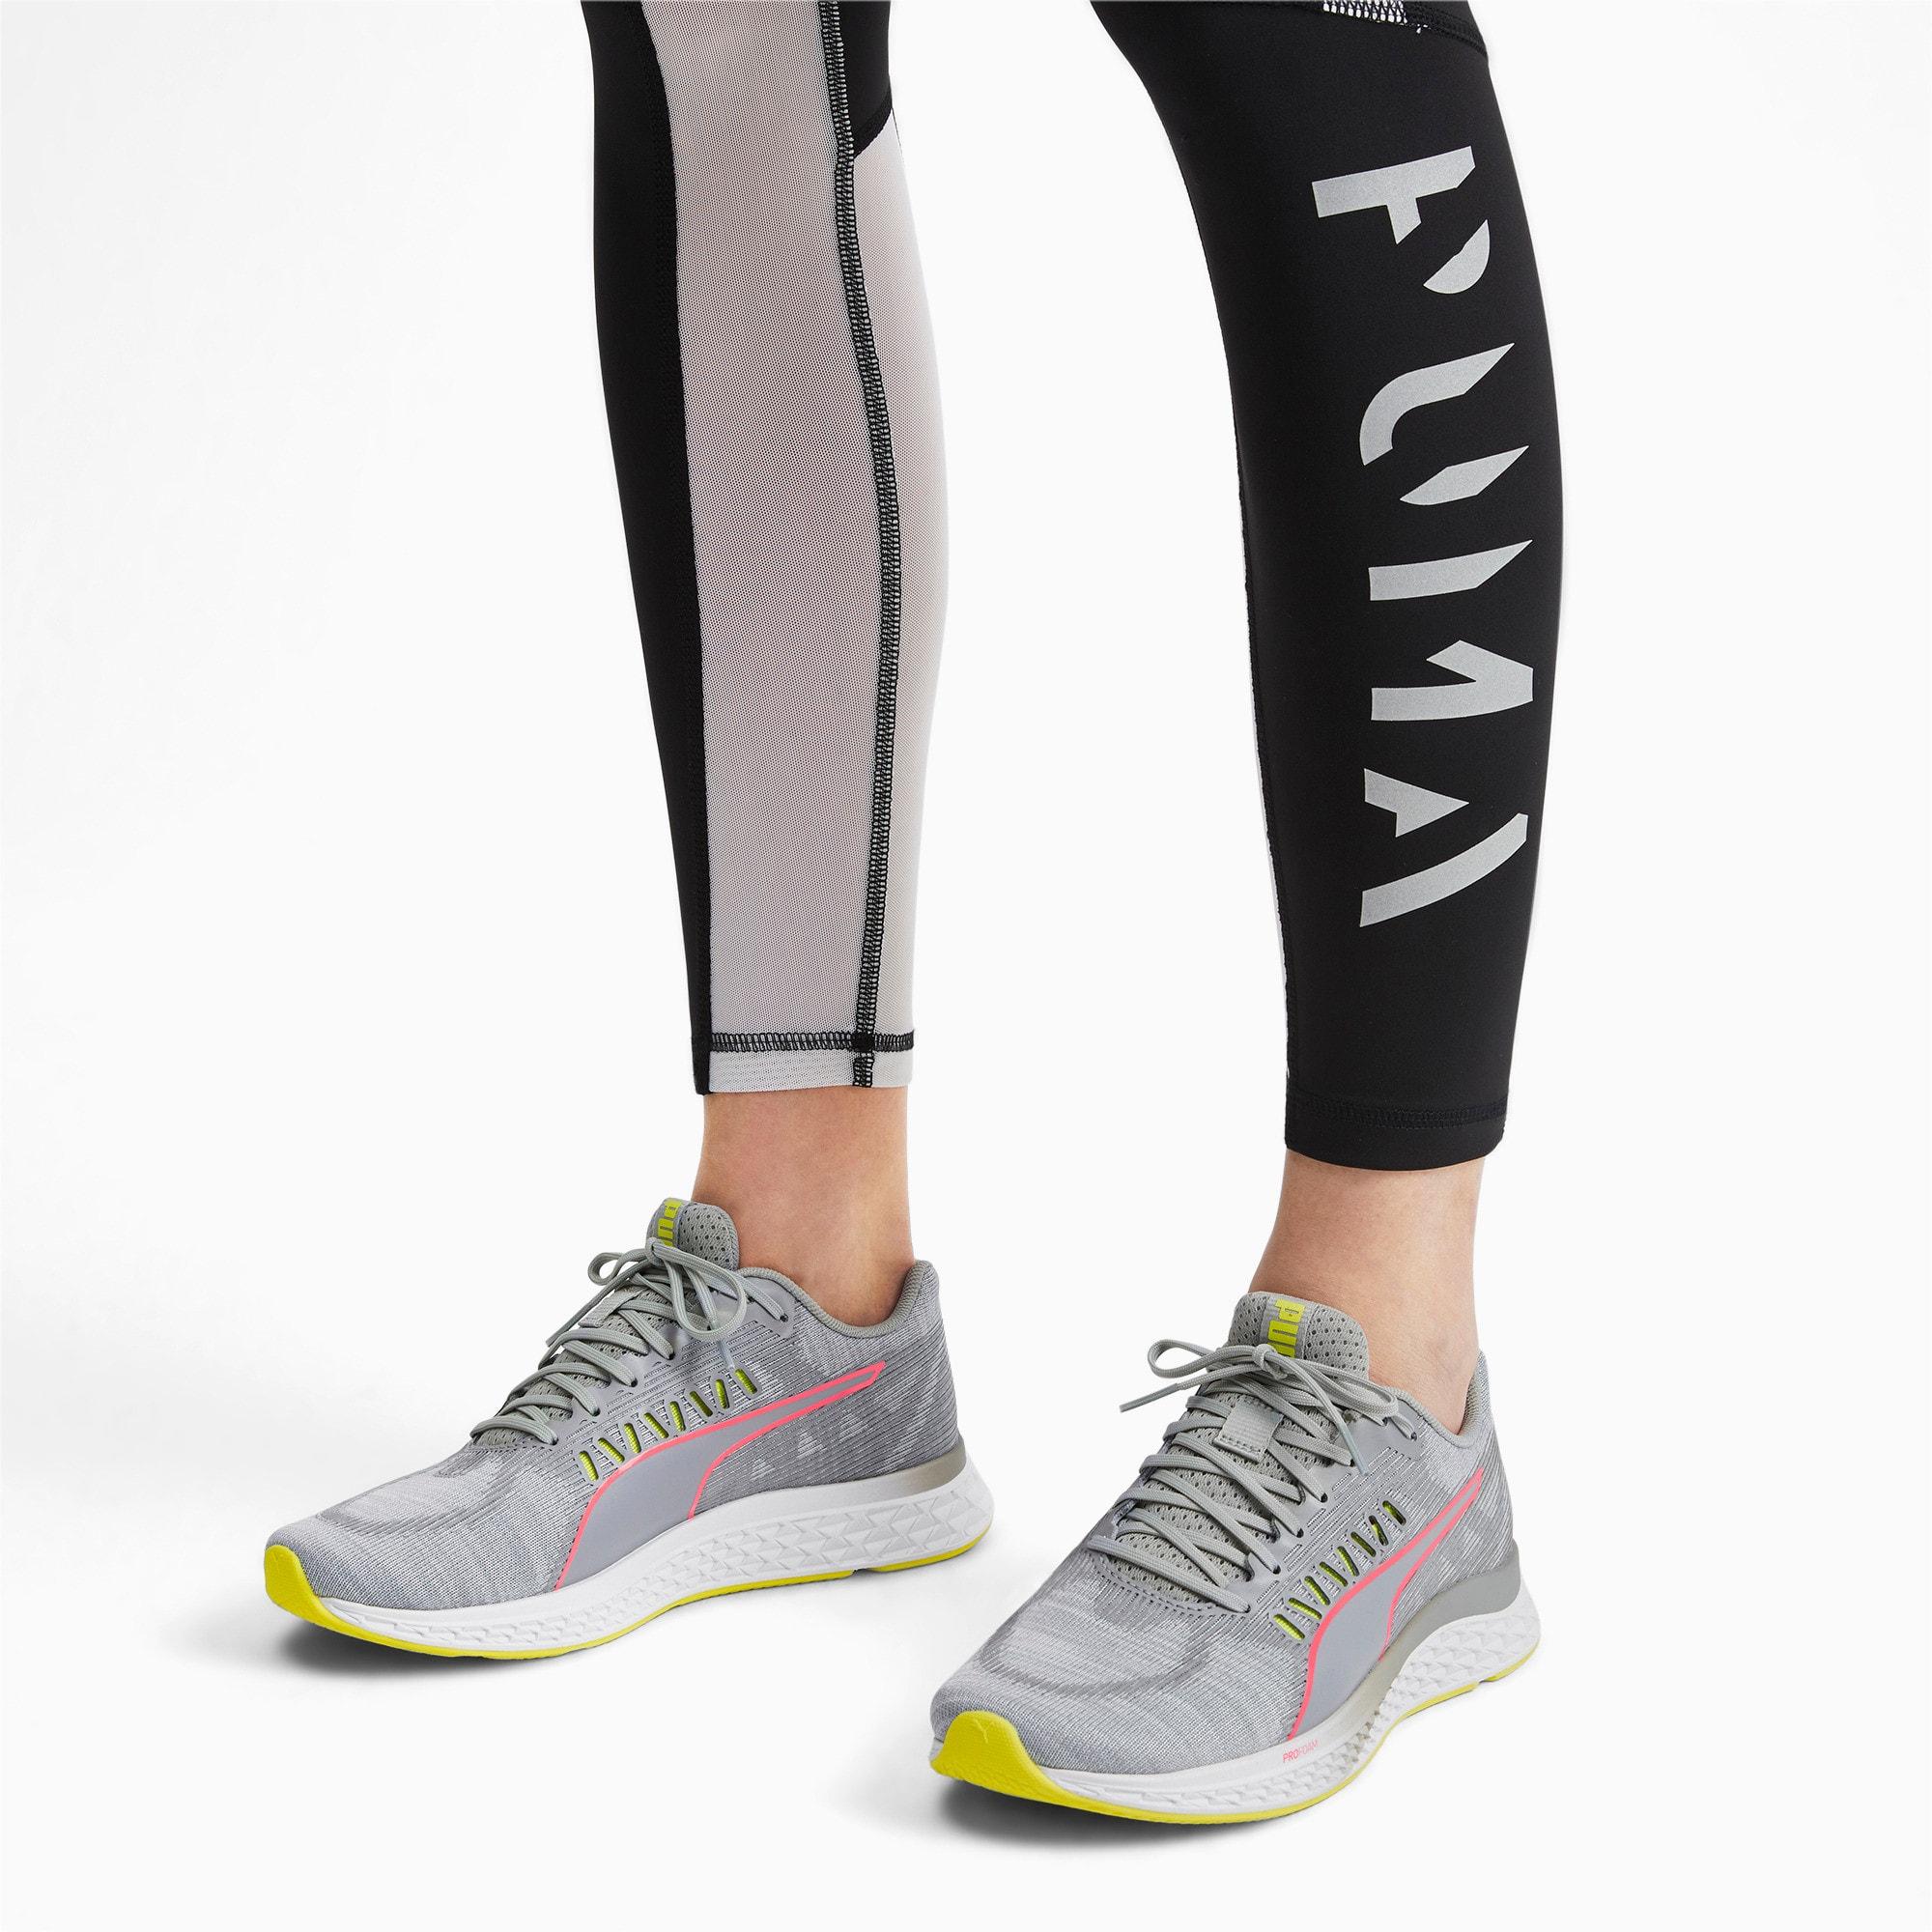 Thumbnail 2 of Speed Sutamina Women's Running Shoes, Quarry-Yellow Alert-Pink, medium-IND